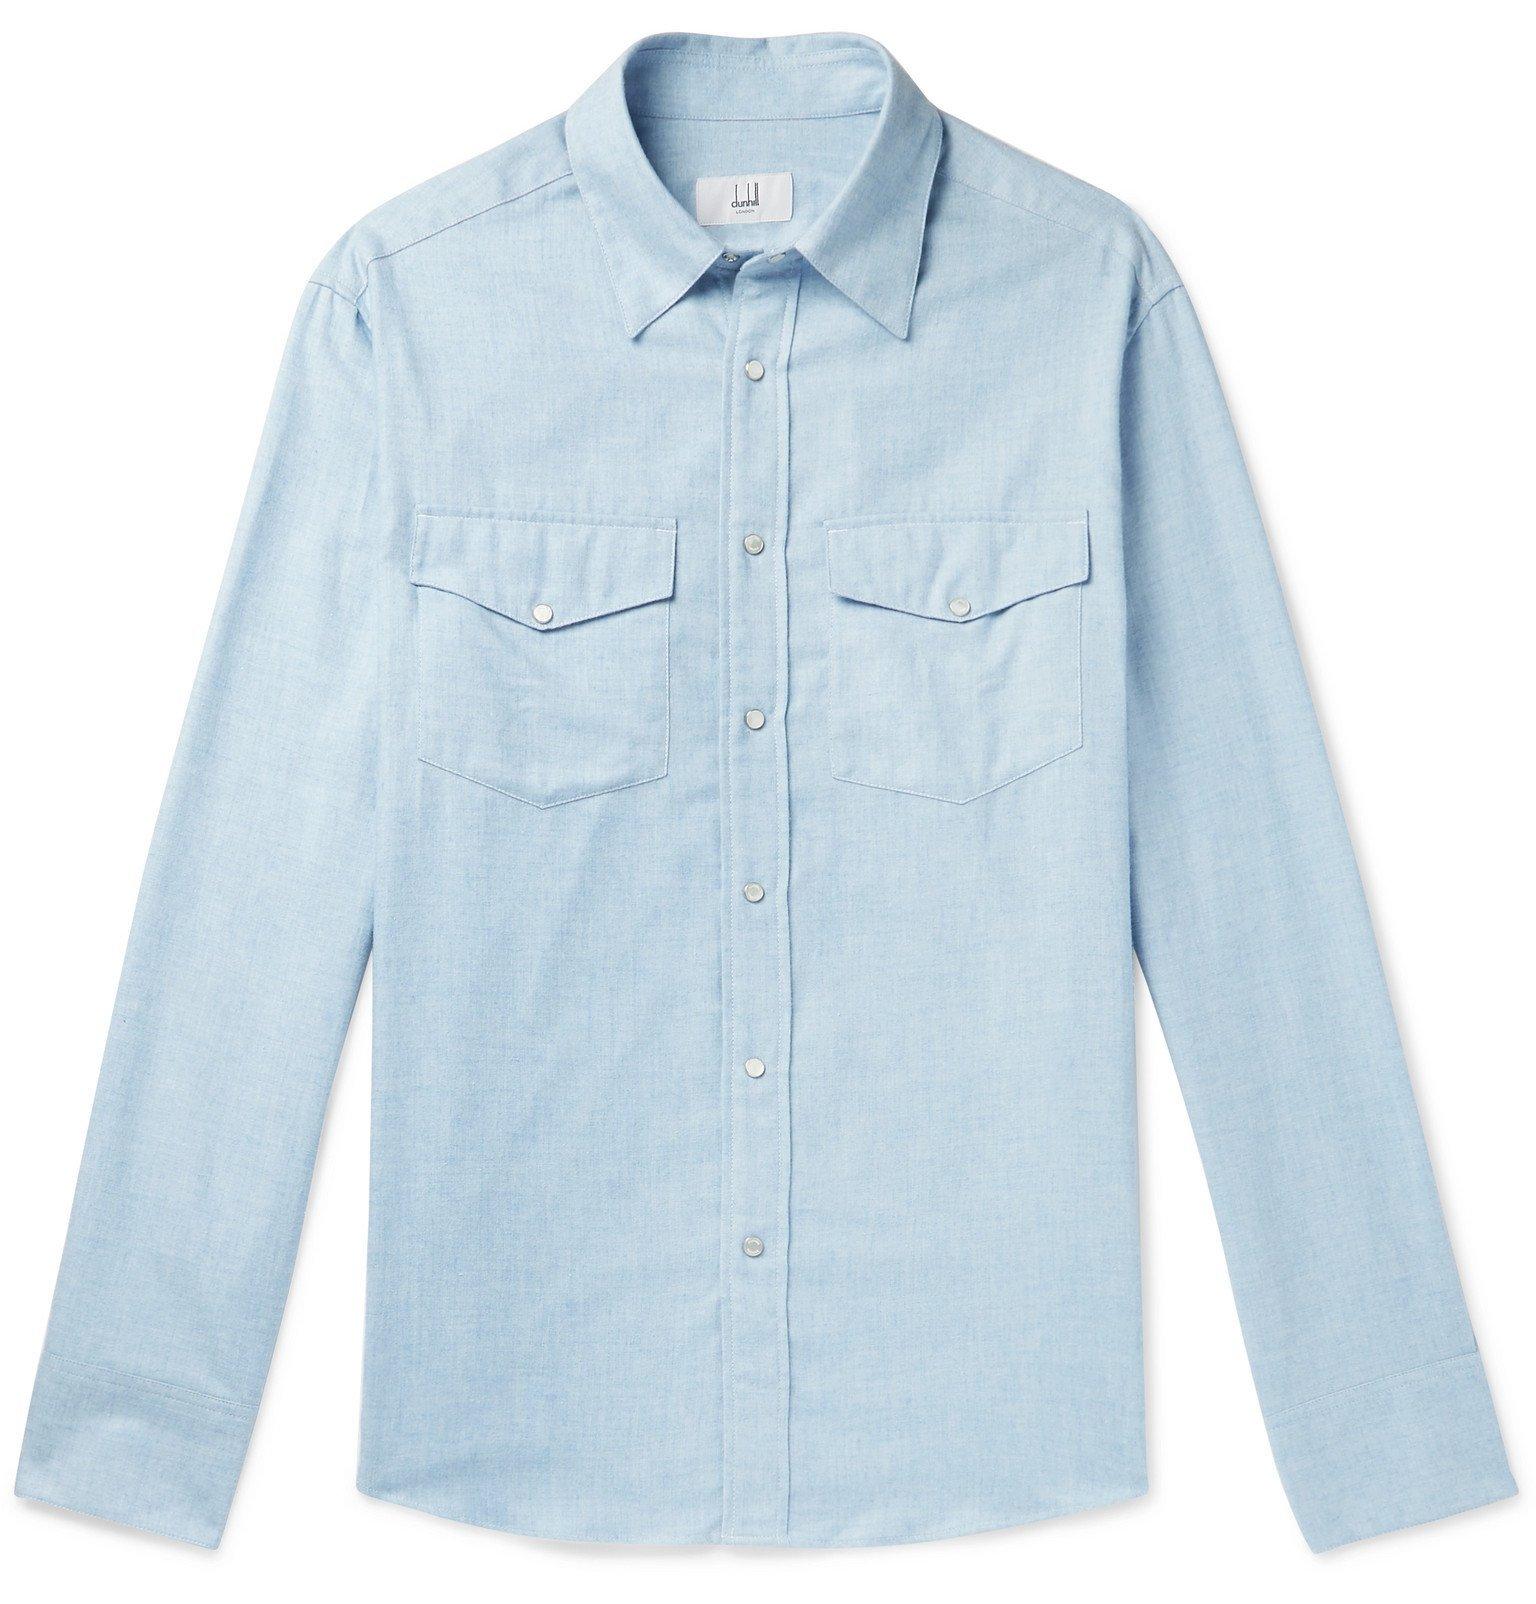 Dunhill - Cotton and Cashmere-Blend Western Shirt - Blue